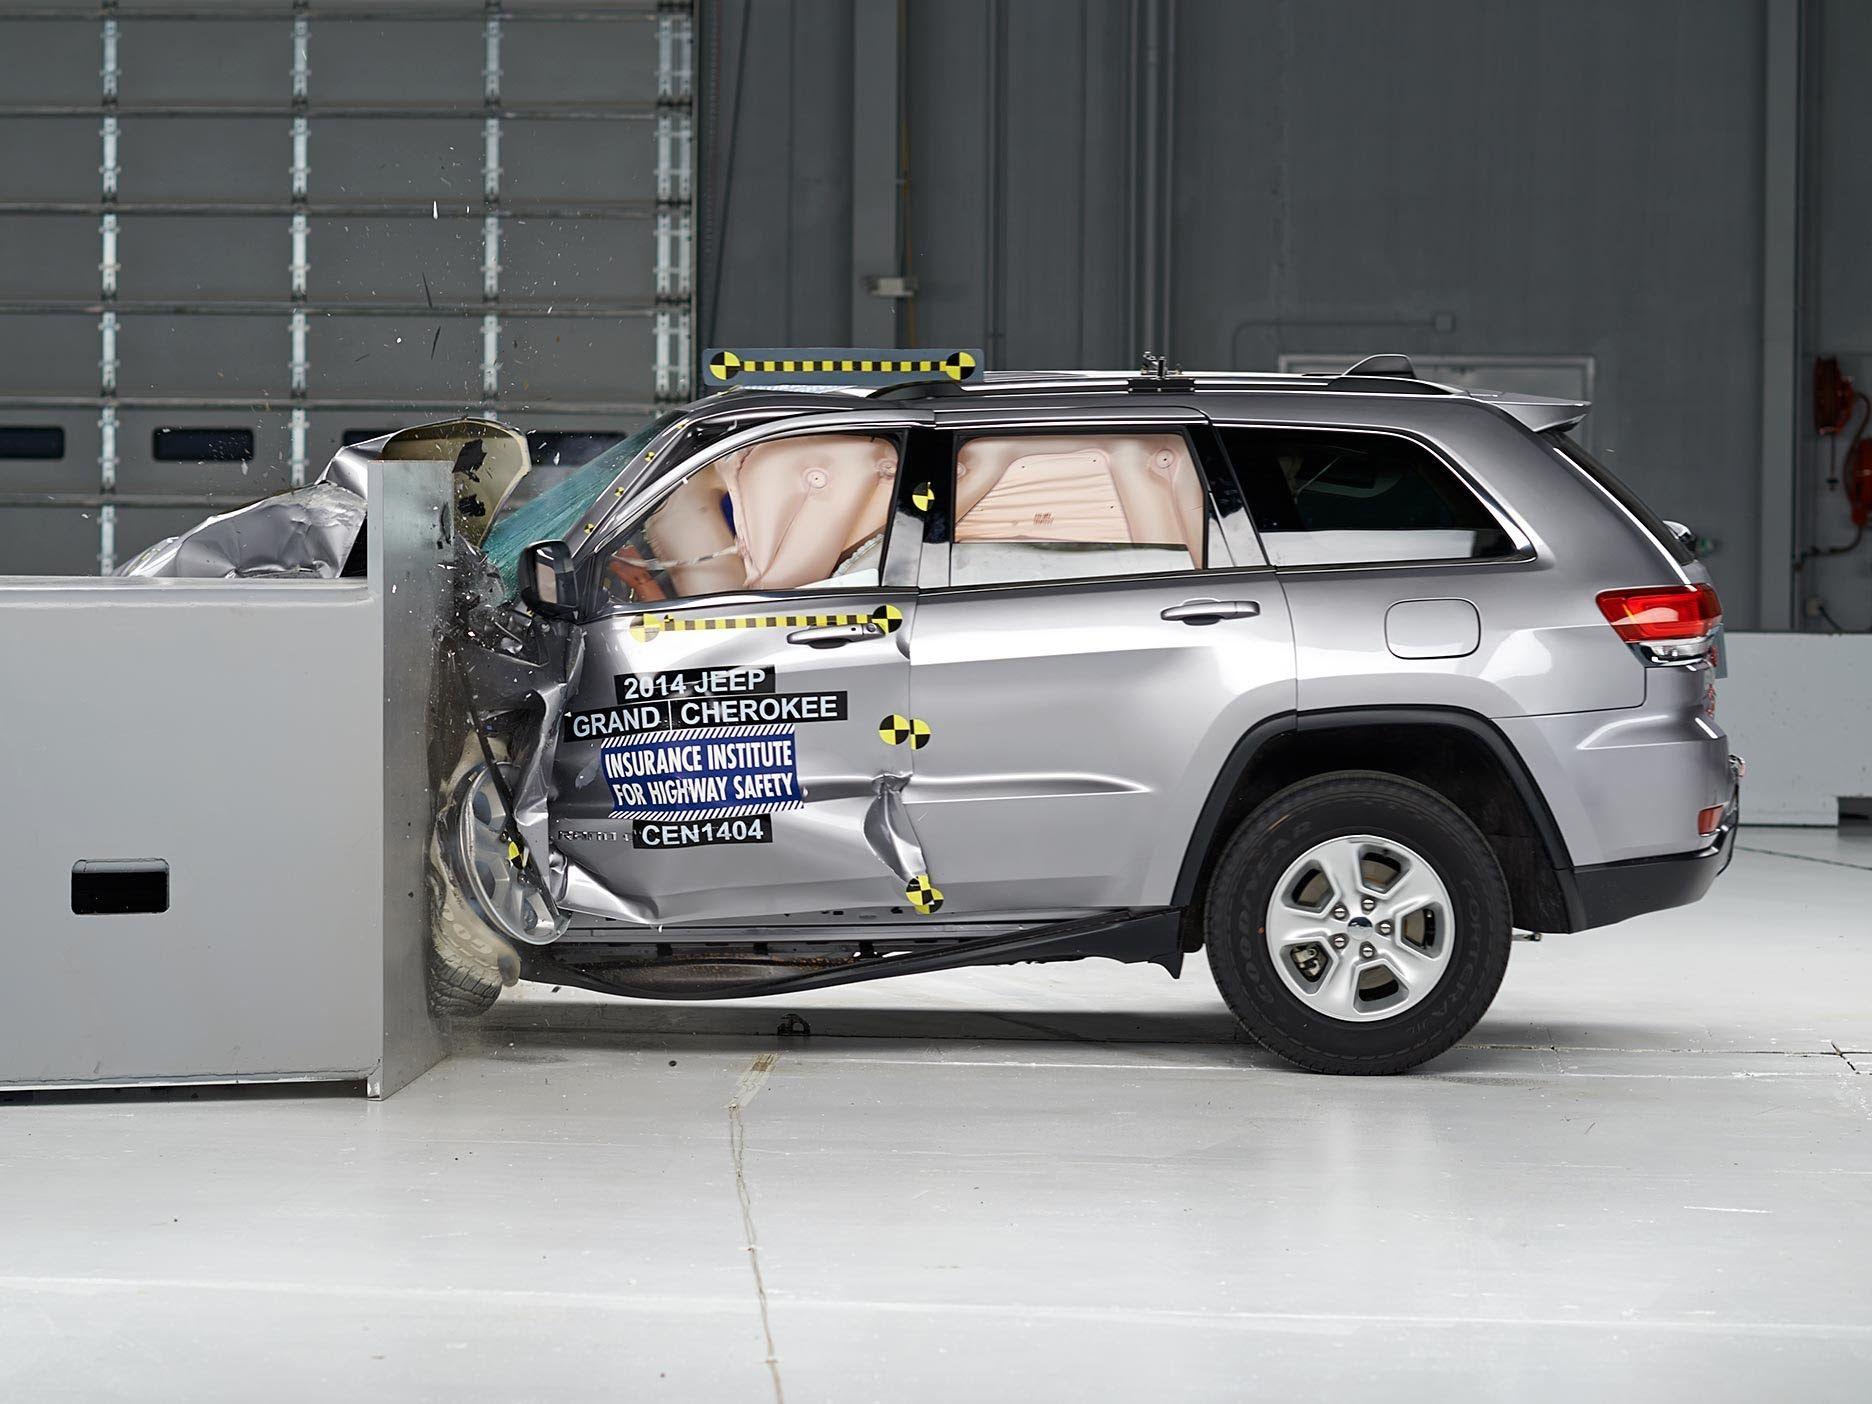 2014 jeep grand cherokee small overlap iihs crash test